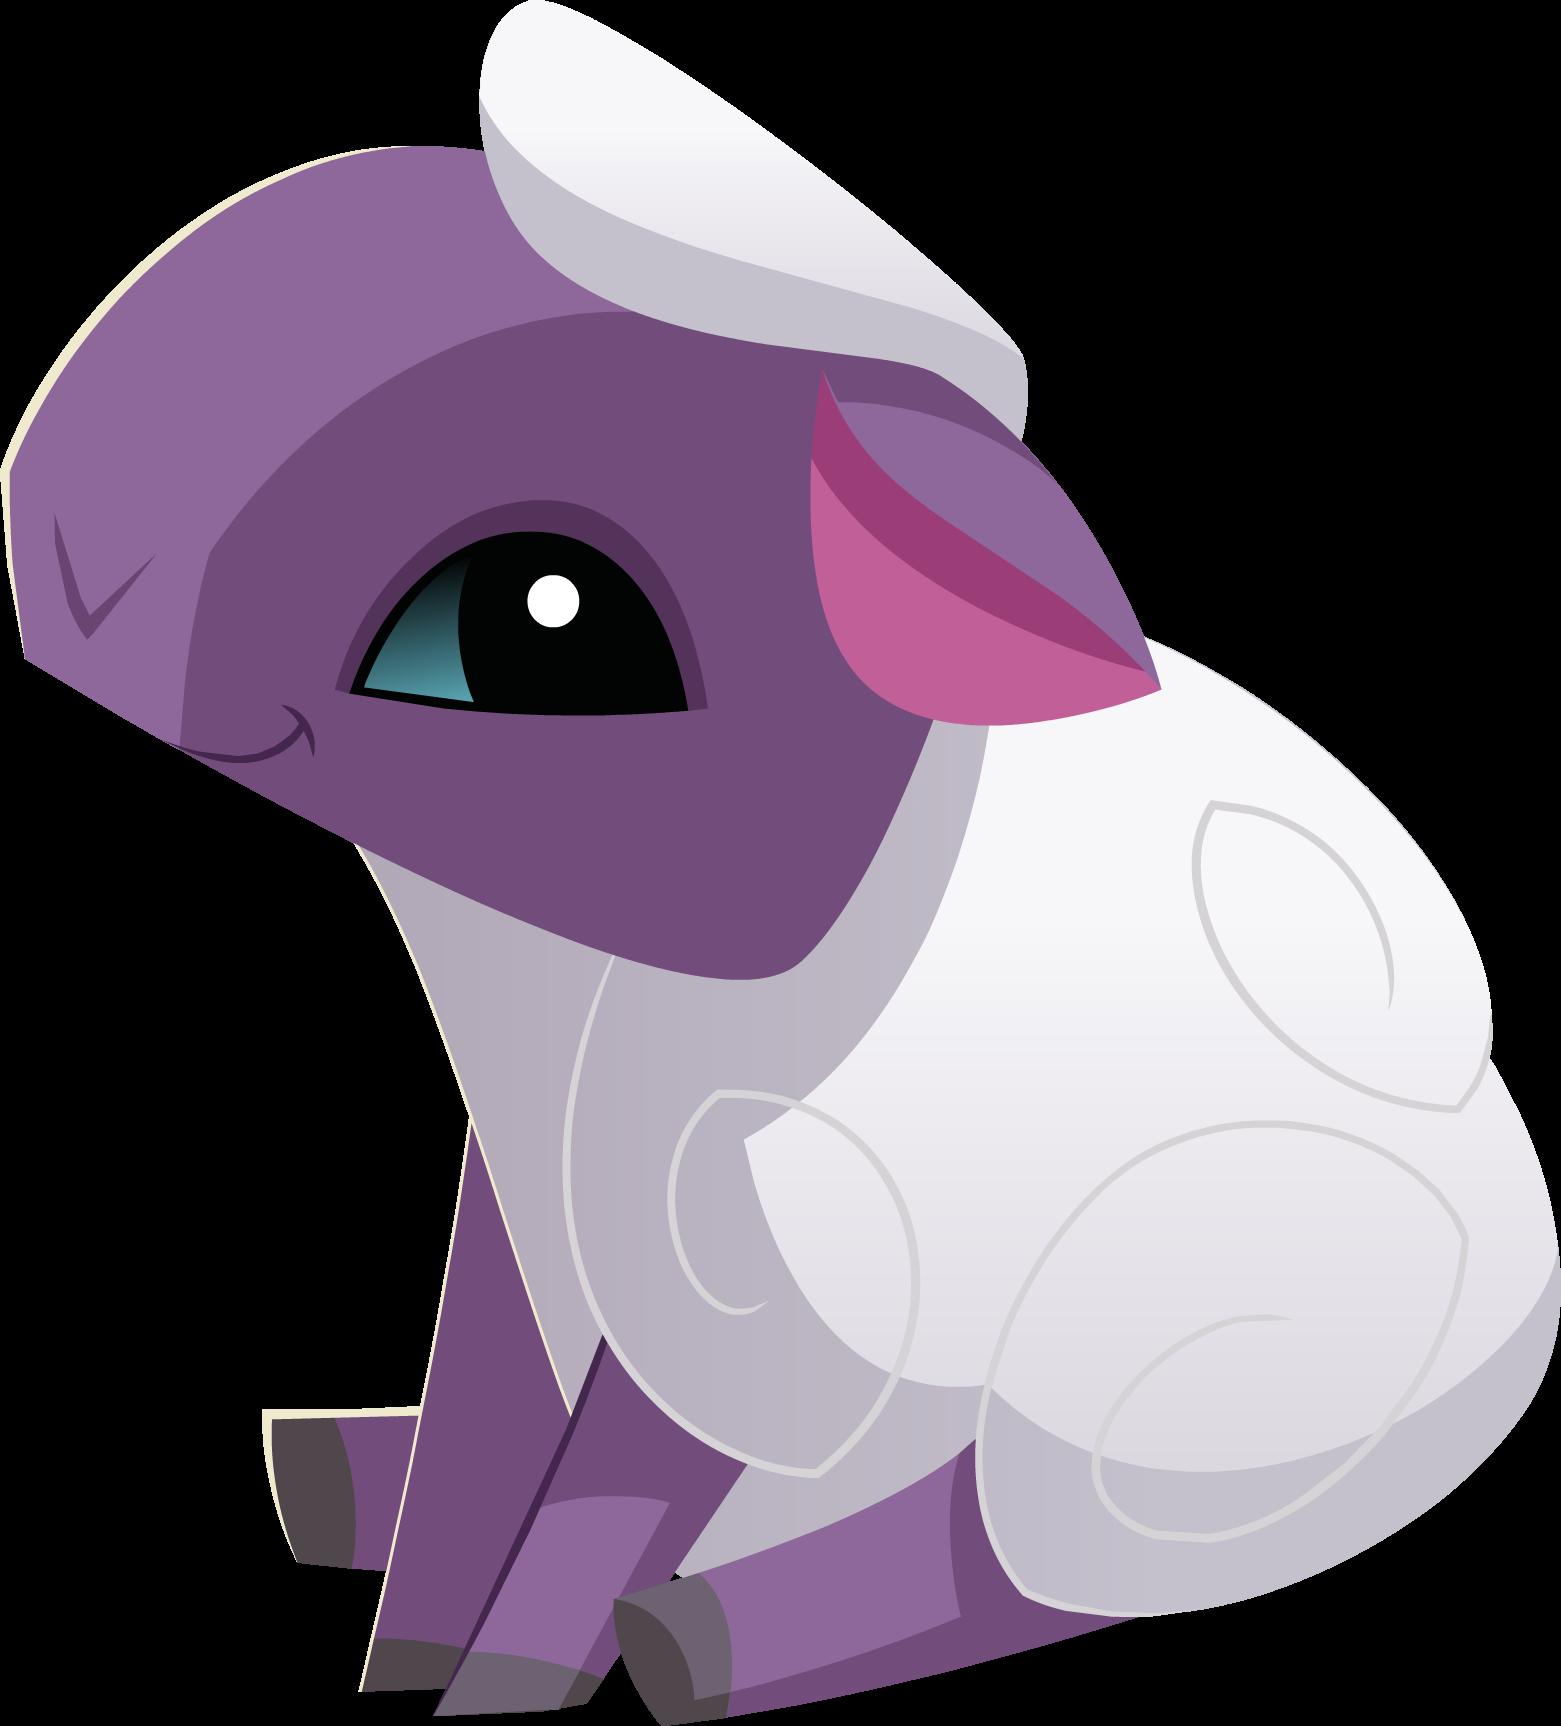 Sheep clipart purple. Image sitting png animal